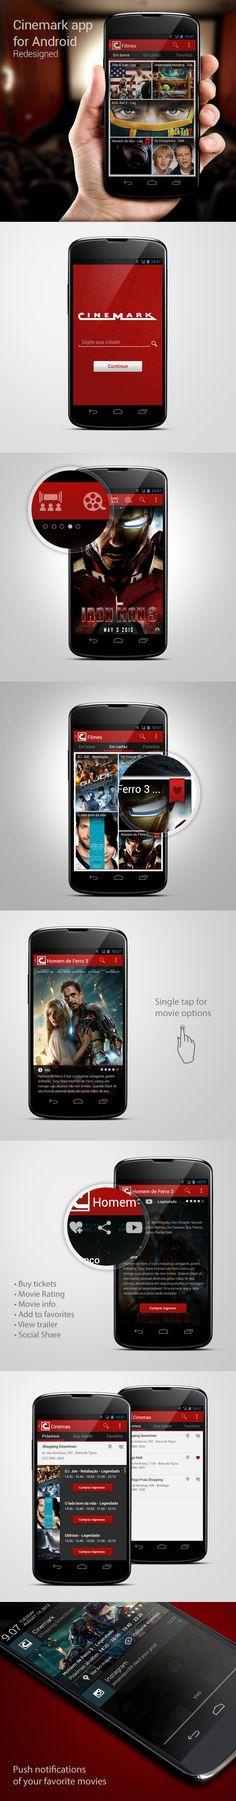 Cinemark app for Android Redesigned by Ricardo Monteiro, via Behance